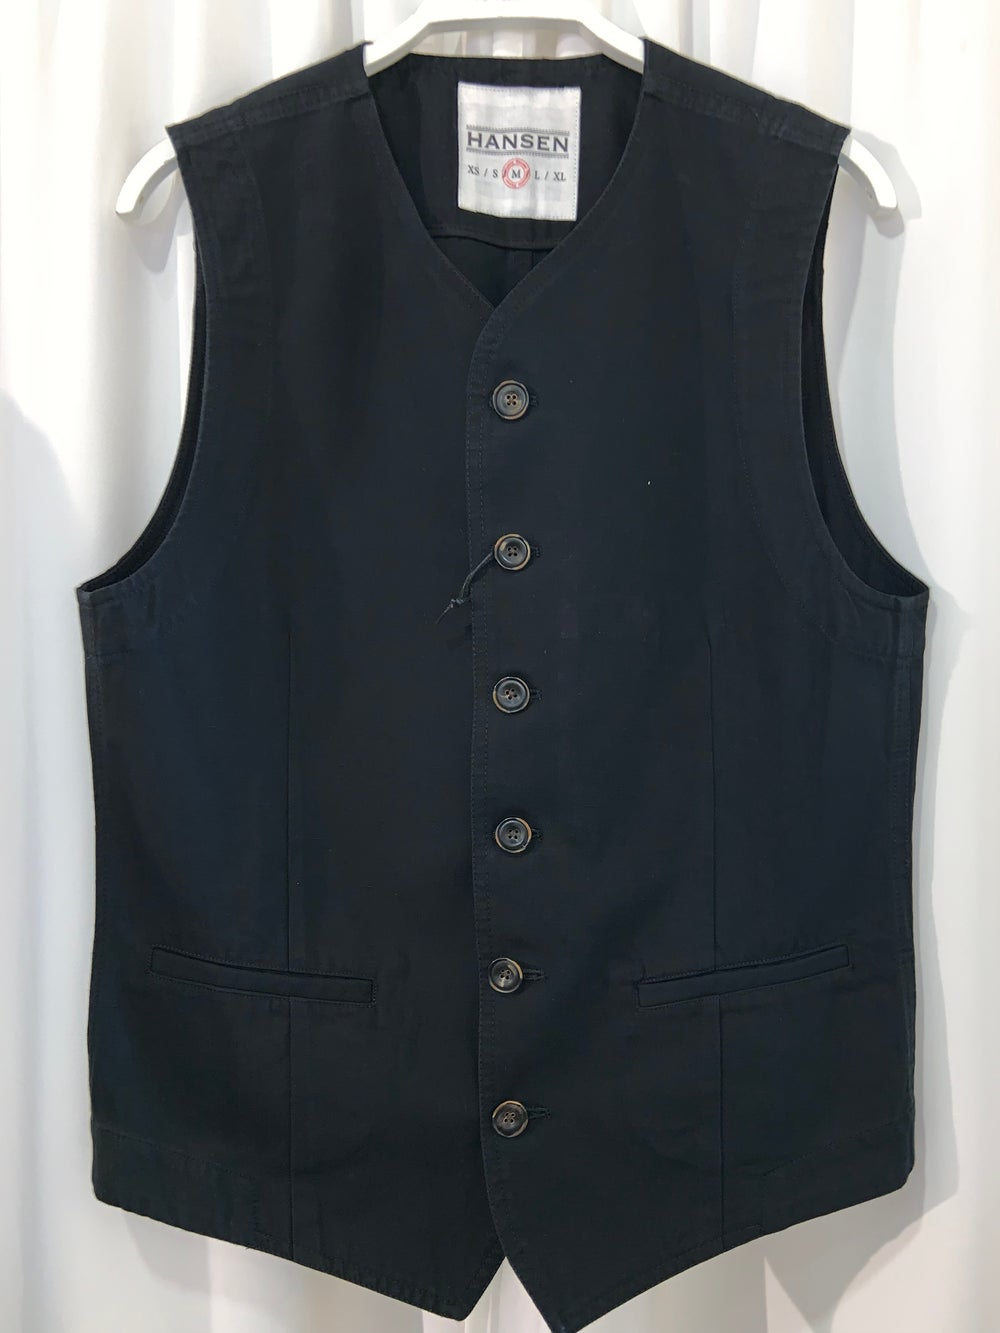 Image of HANSEN's KAJ Waistcoat